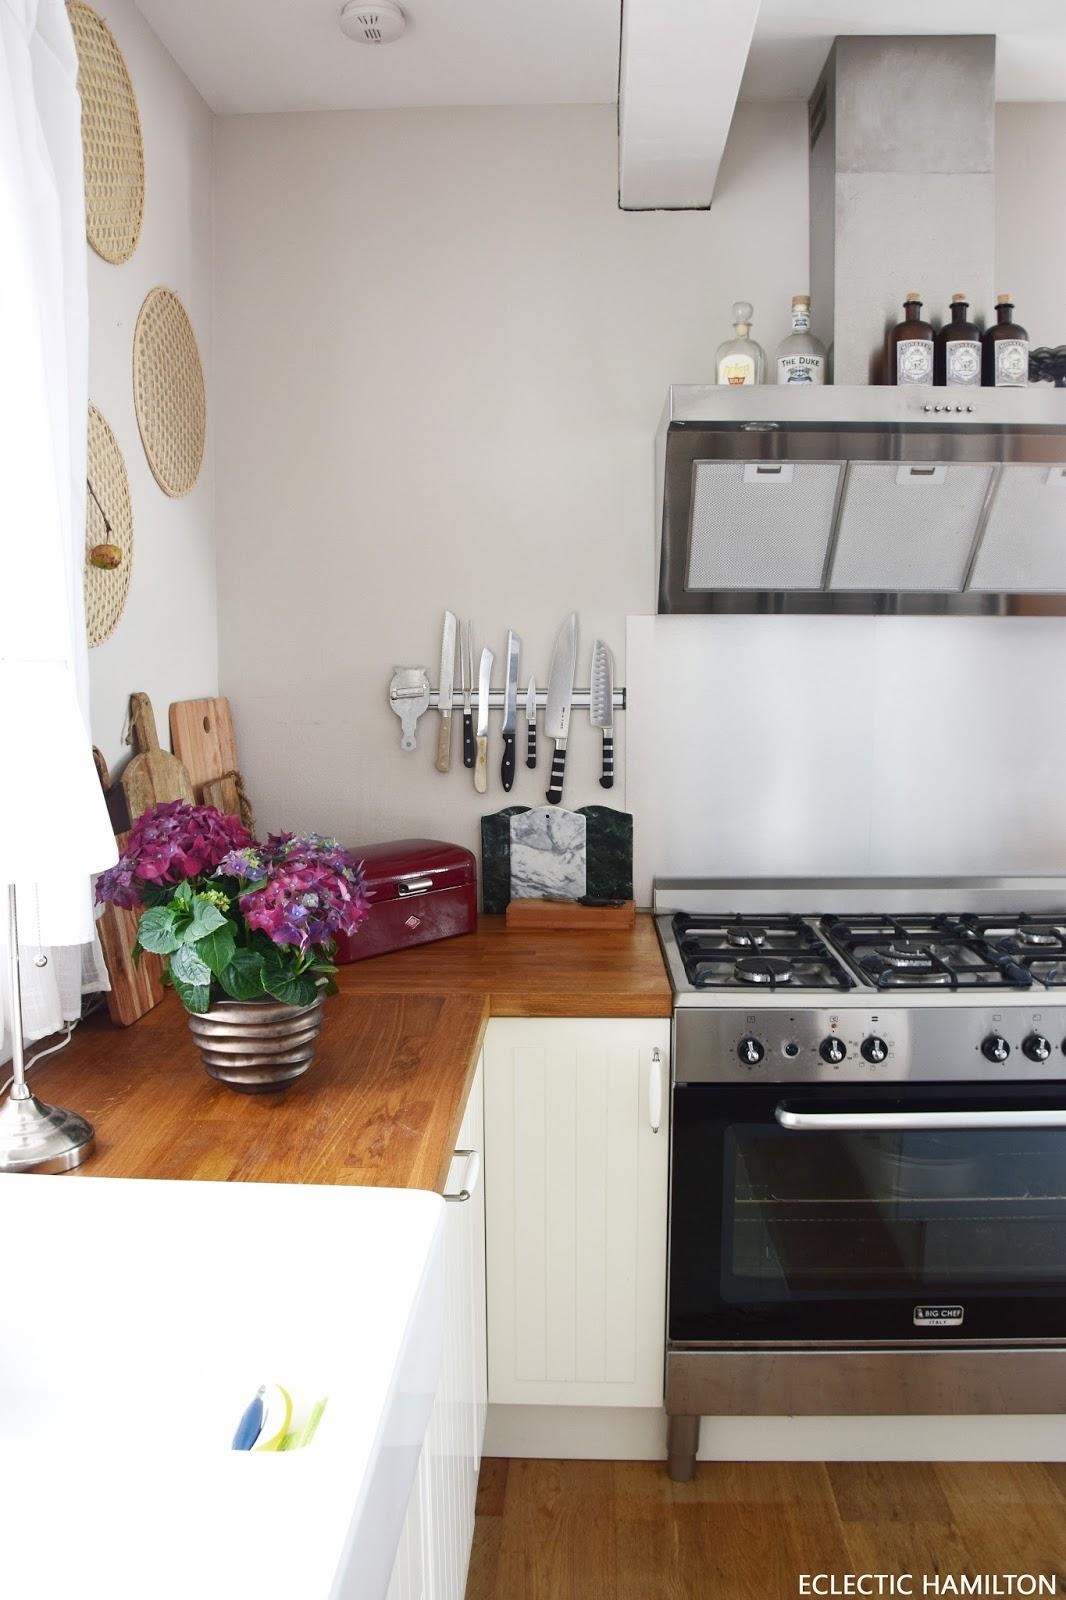 Tisch Set Deko Dekoration Wand Wanddeko Küche DIY kreativ 14